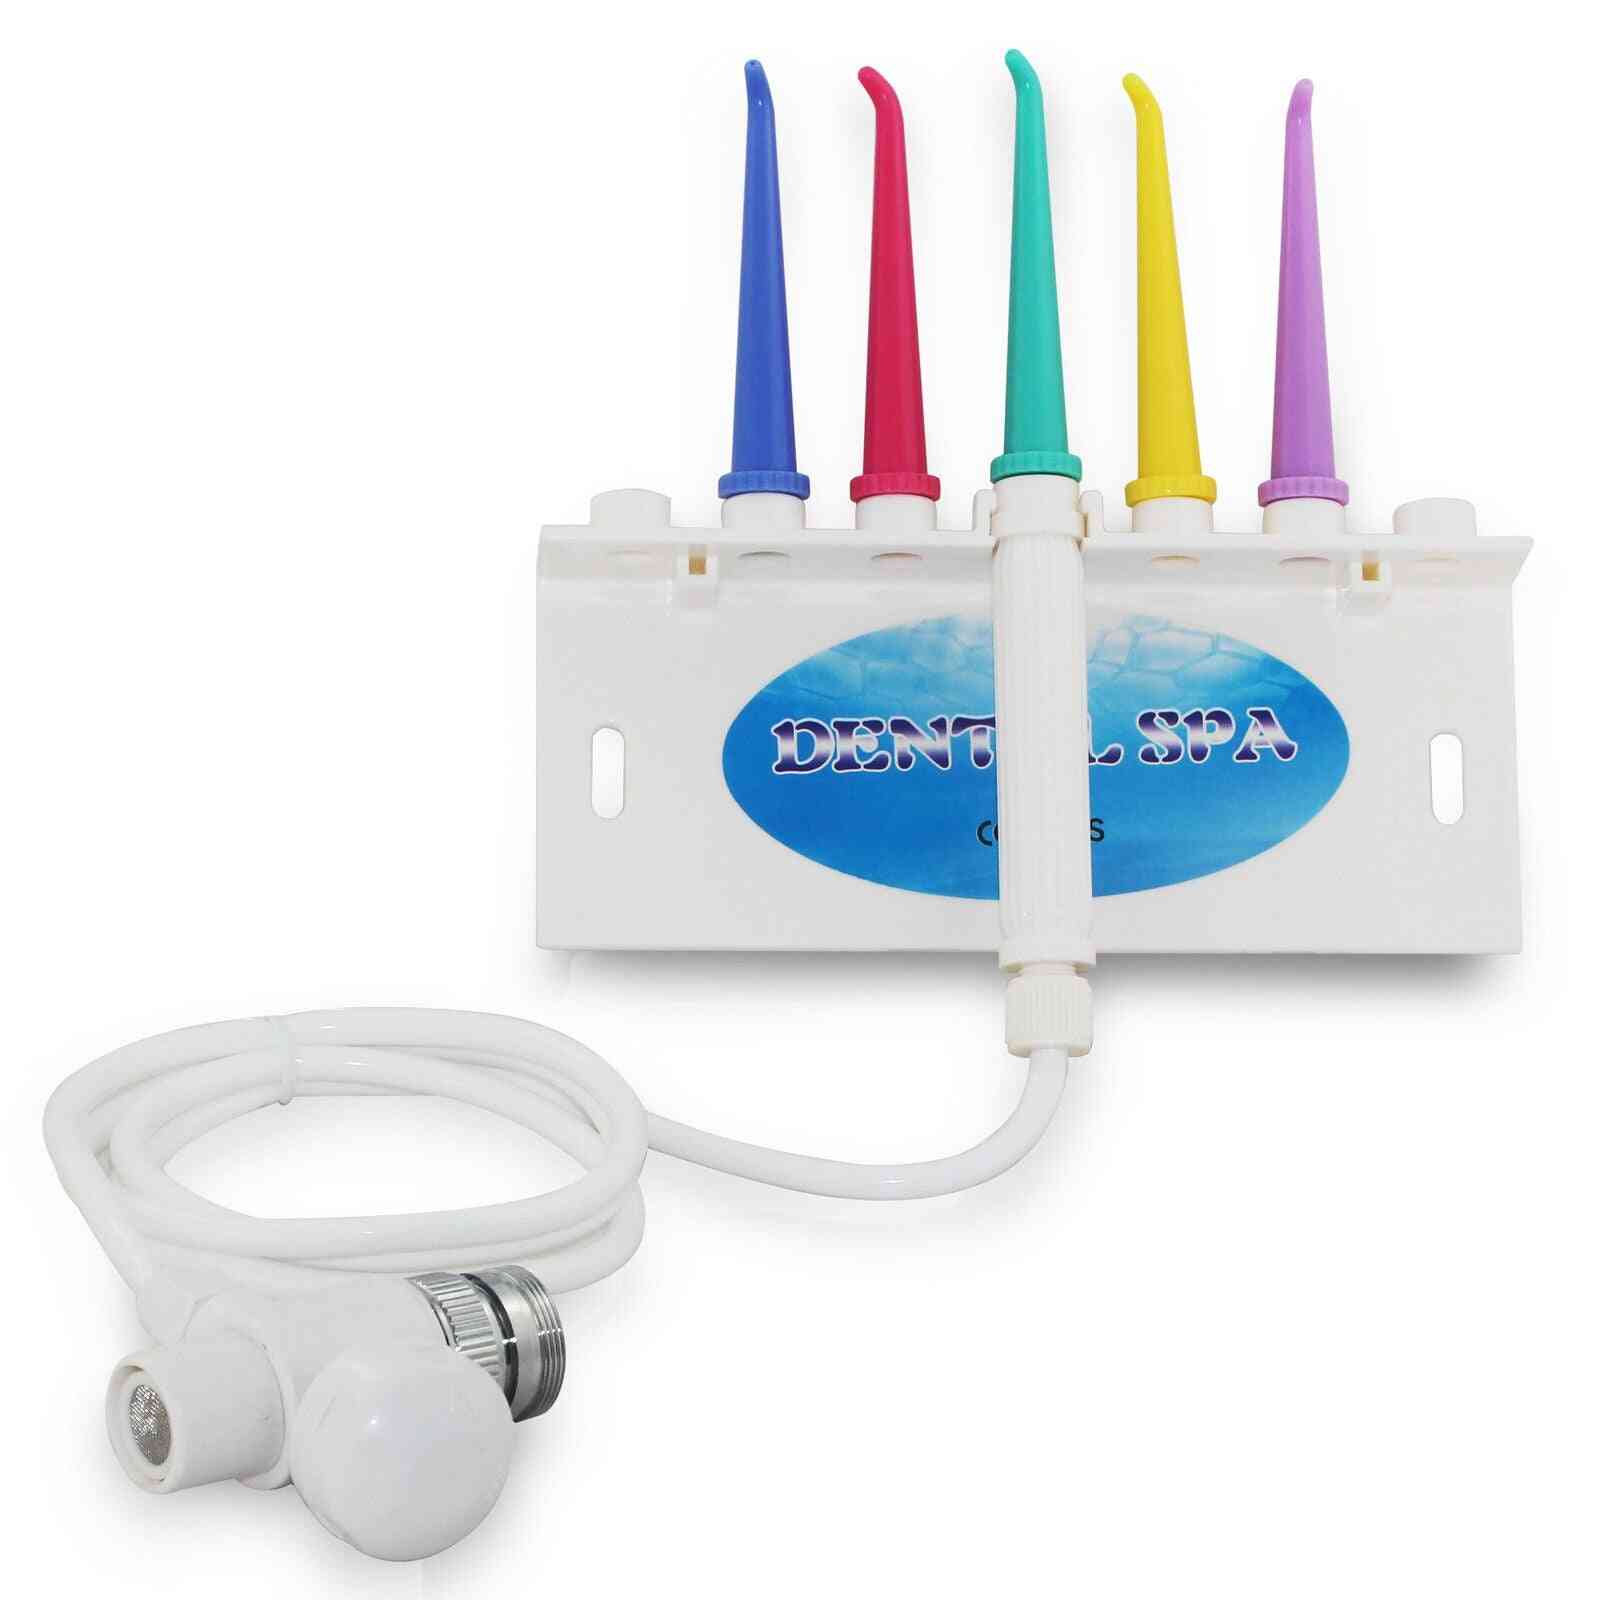 Faucet Water Oral Irrigator Dental Flosser